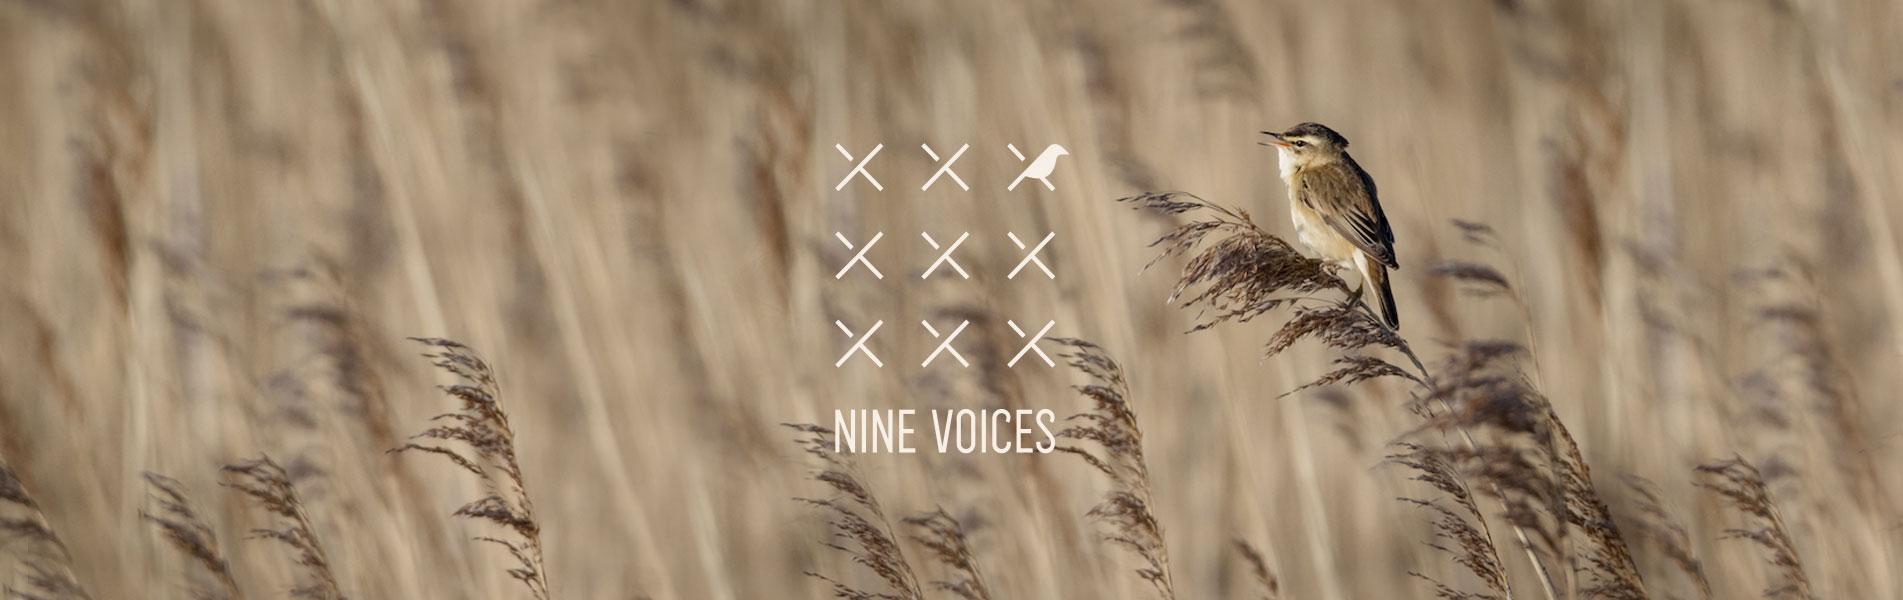 Nine voices